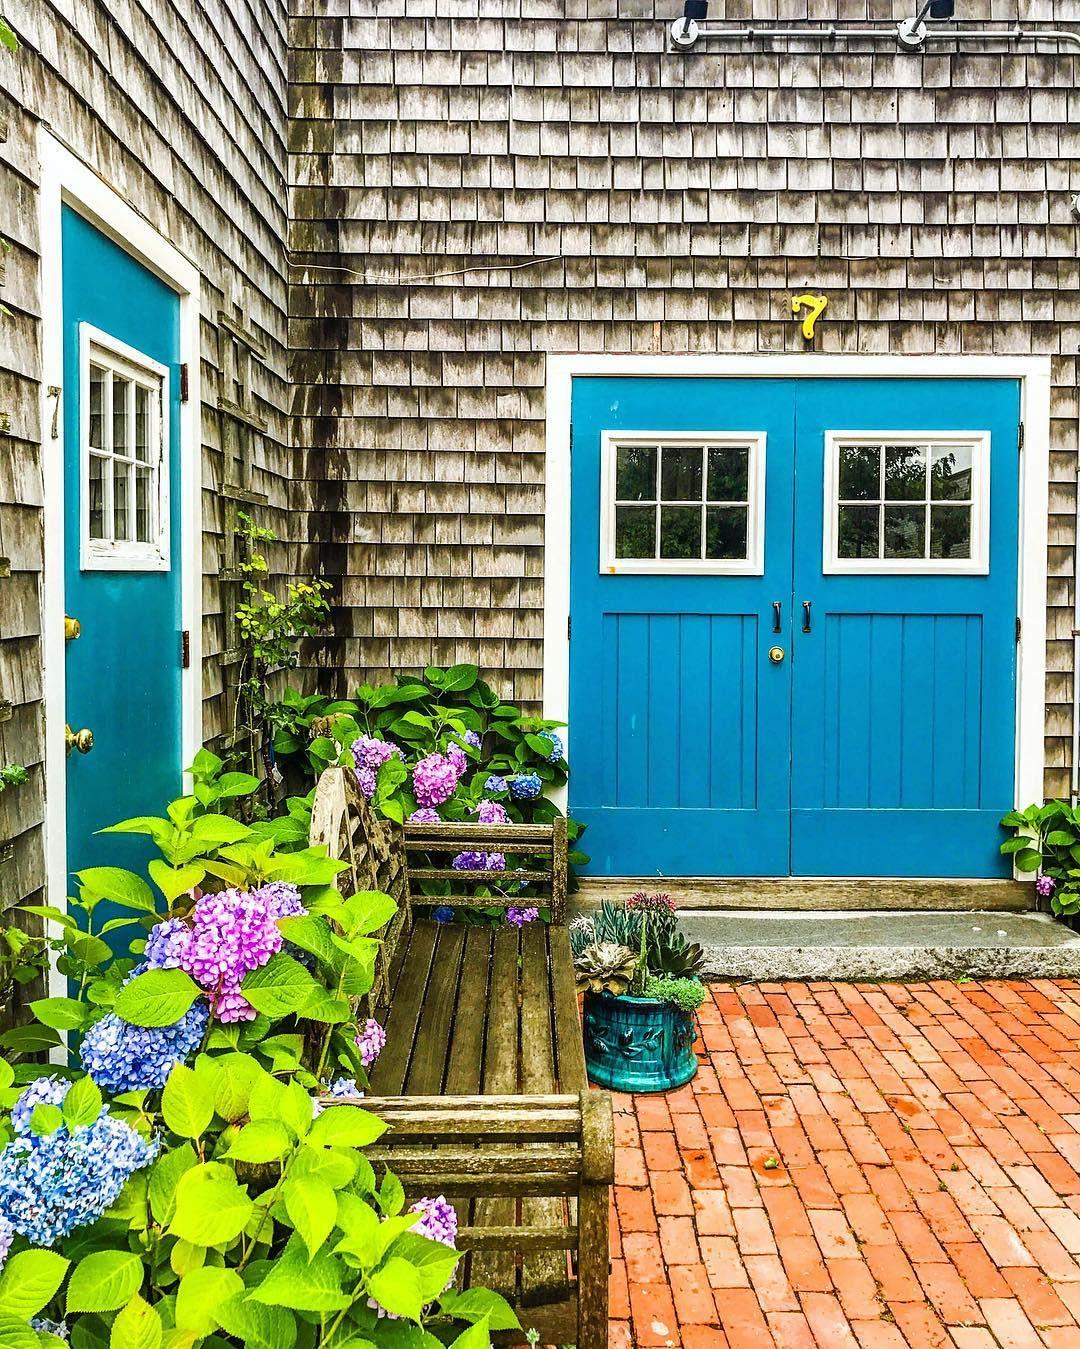 Kawaii Island Go Vacation: Hydrangea Heaven And Cute Corners Of Nantucket